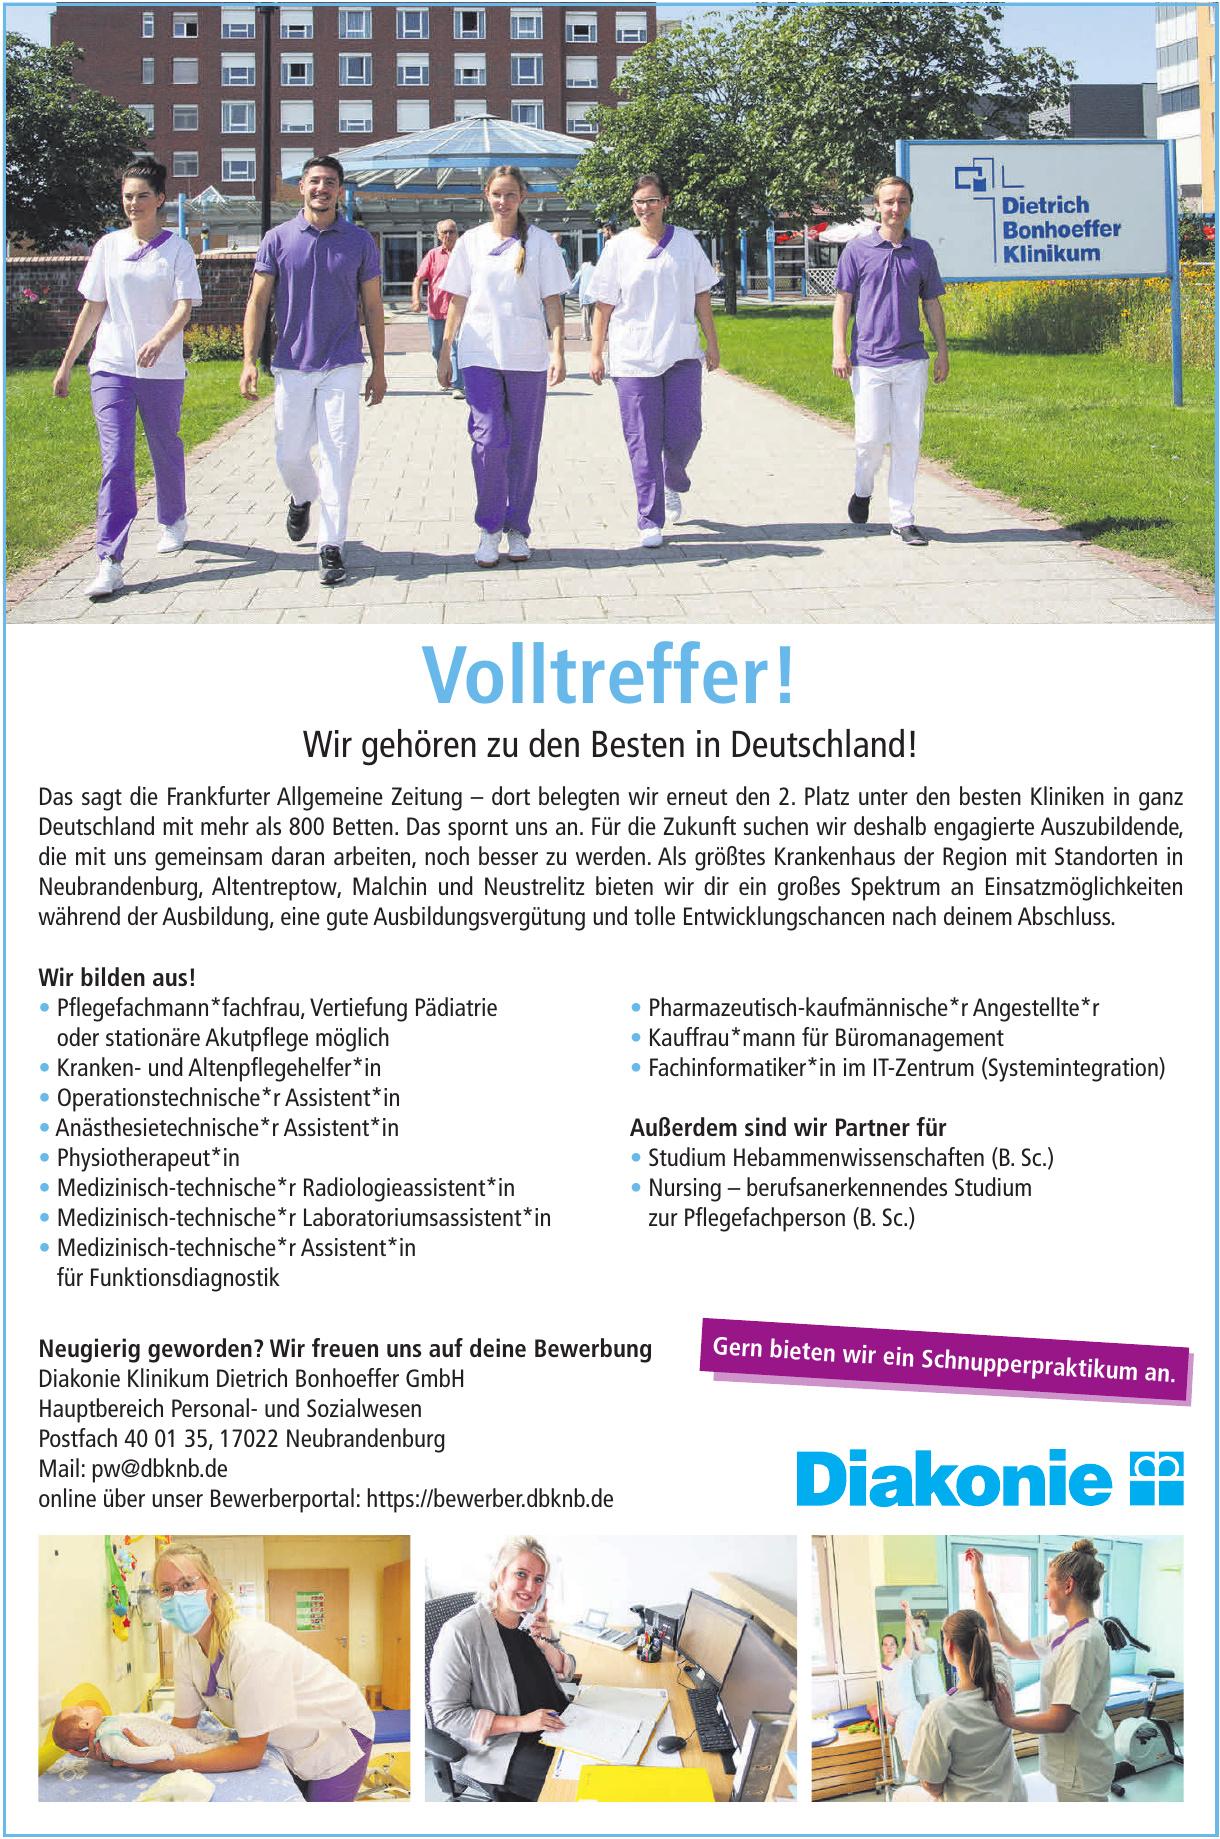 Diakonie Klinikum Dietrich Bonhoeffer GmbH